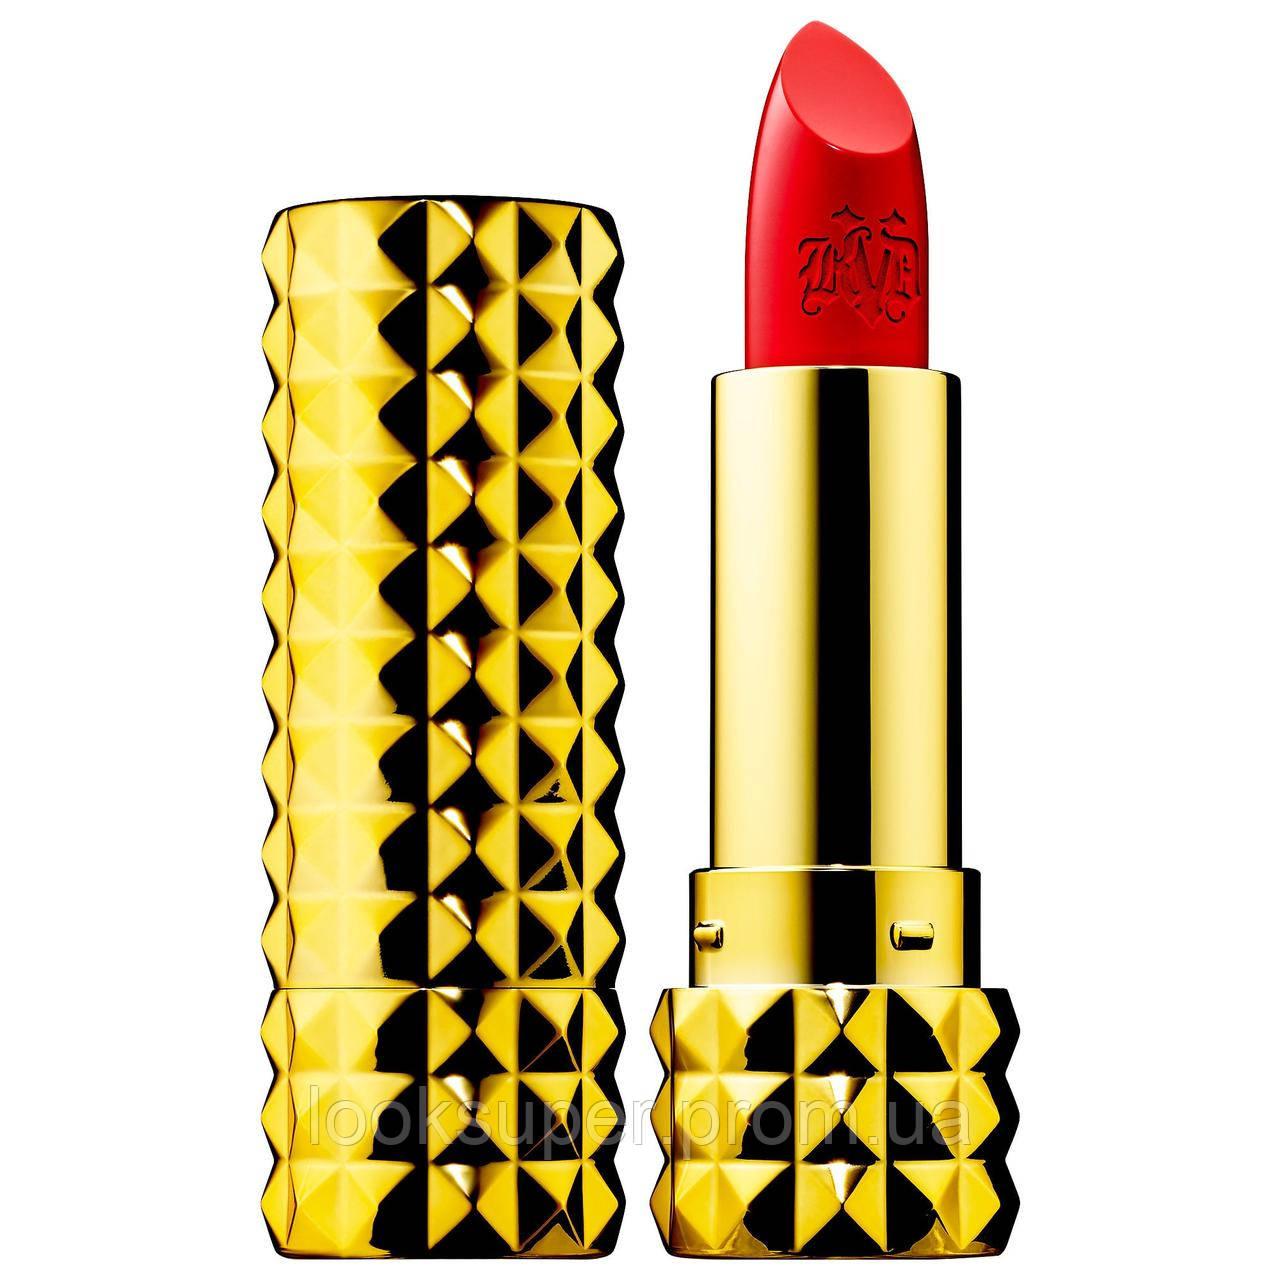 Помада для губ KAT VON D 10th Anniversary Studded Kiss Crème Lipstick SANTA SANGRE 3.4g